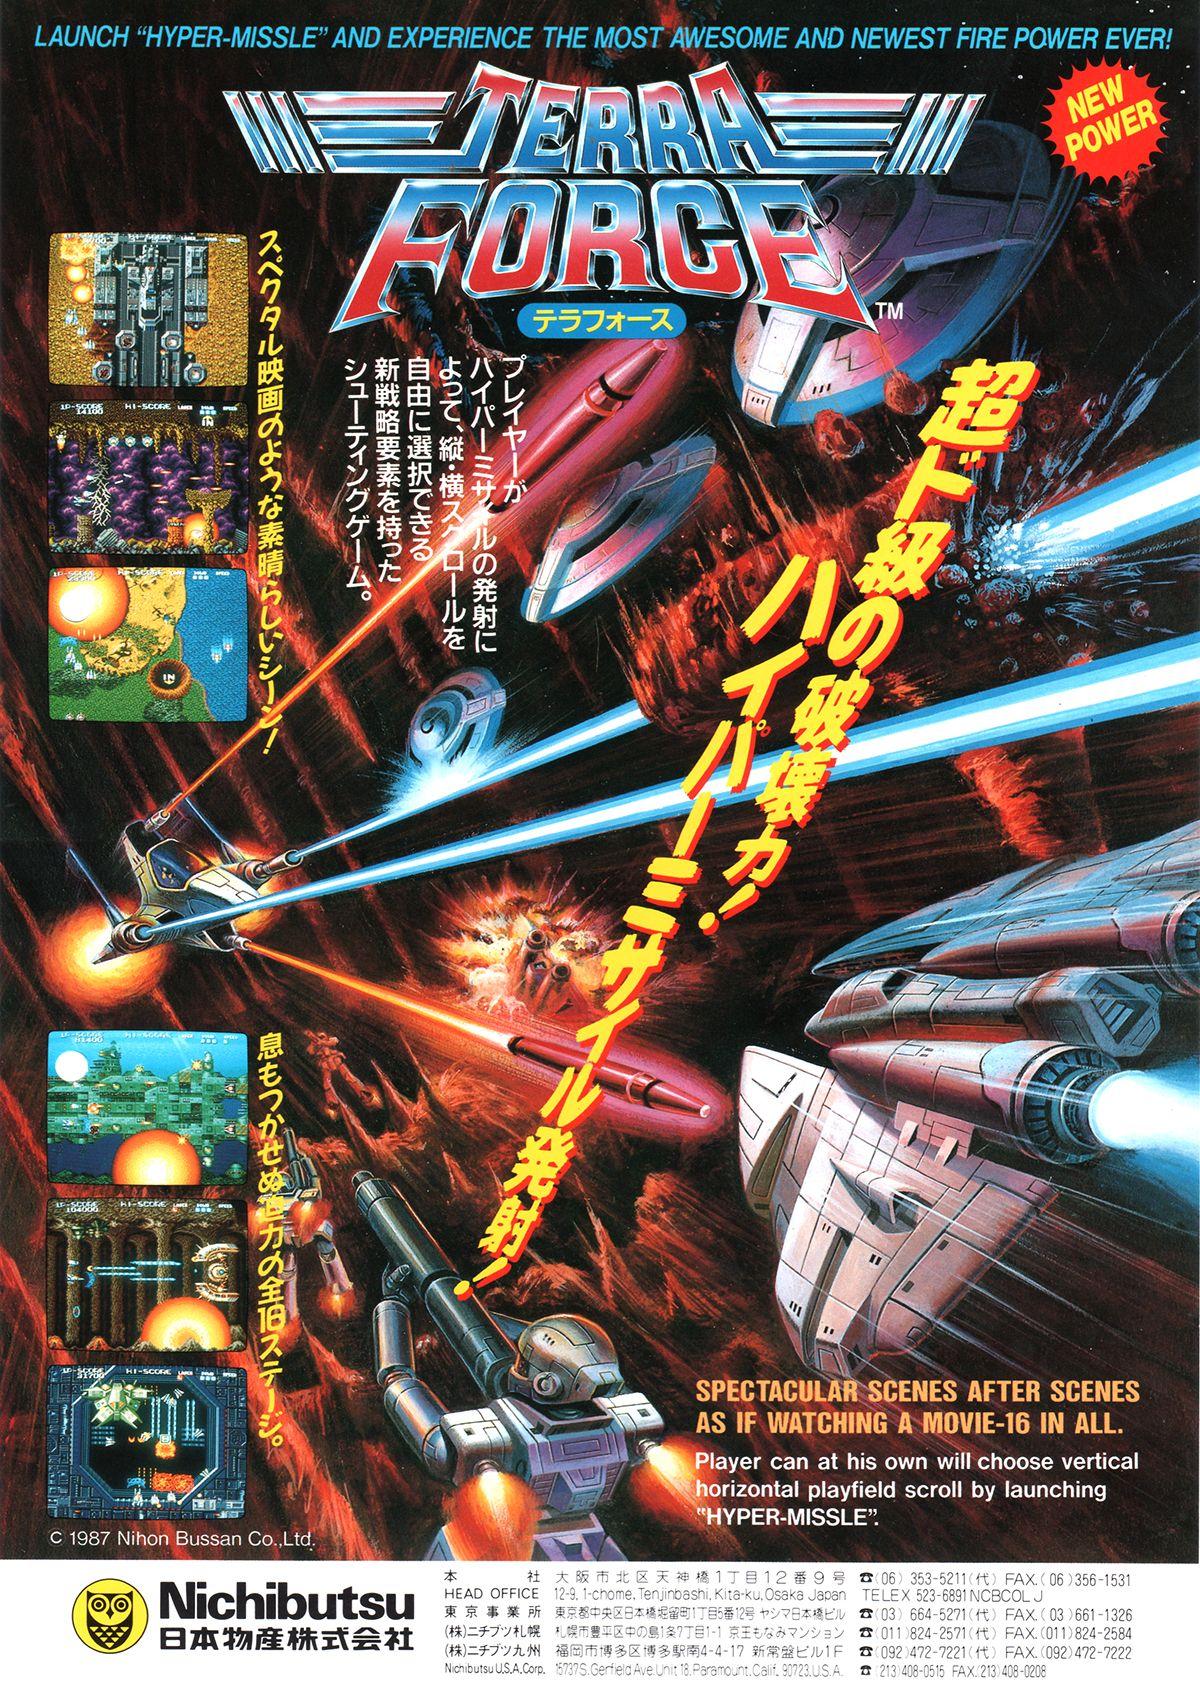 Terra Force (1987) Retro gaming, Video game music